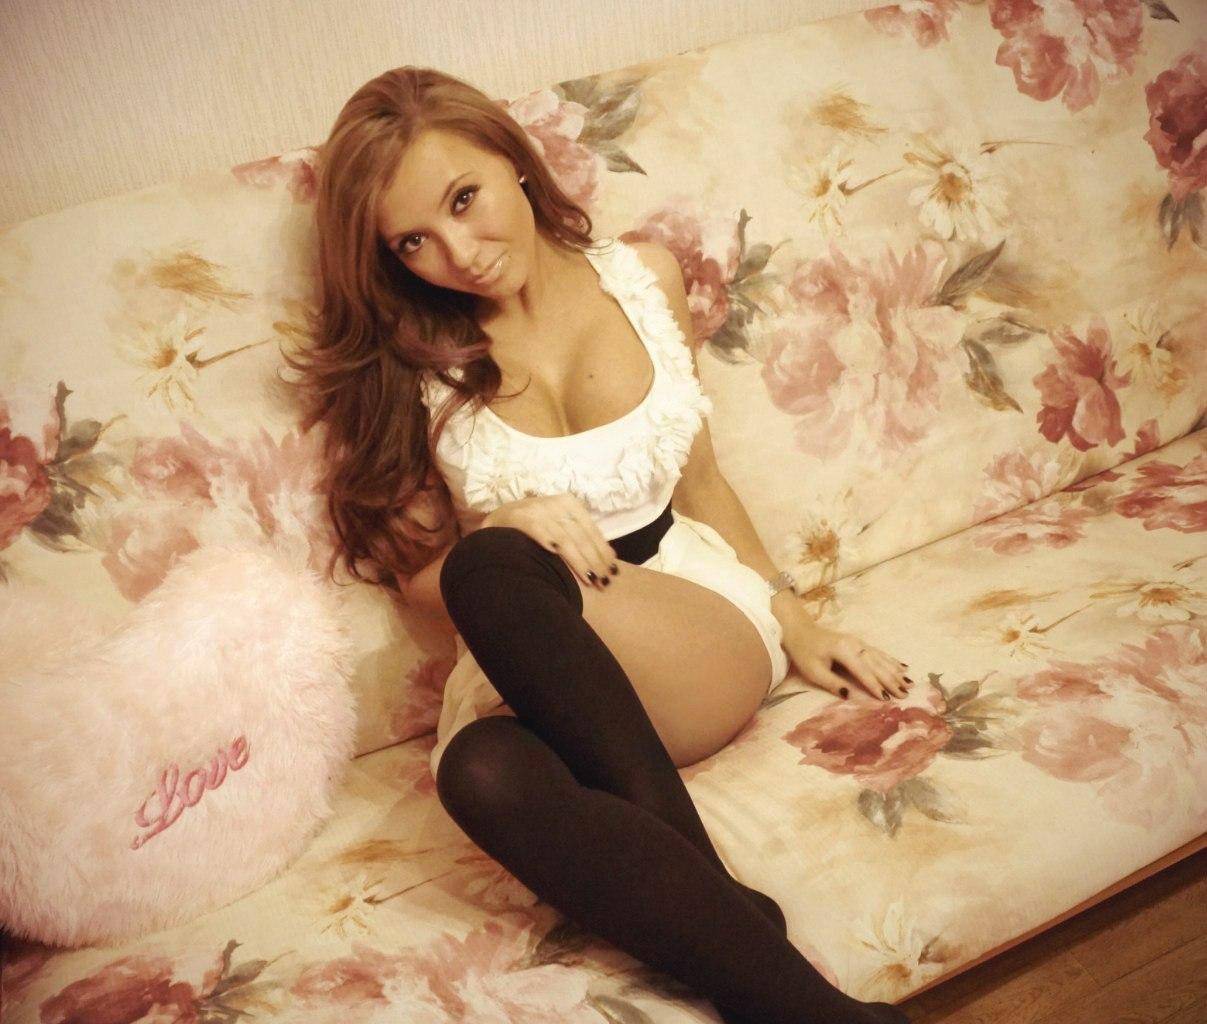 Индивидуалка воркута mature проститутки